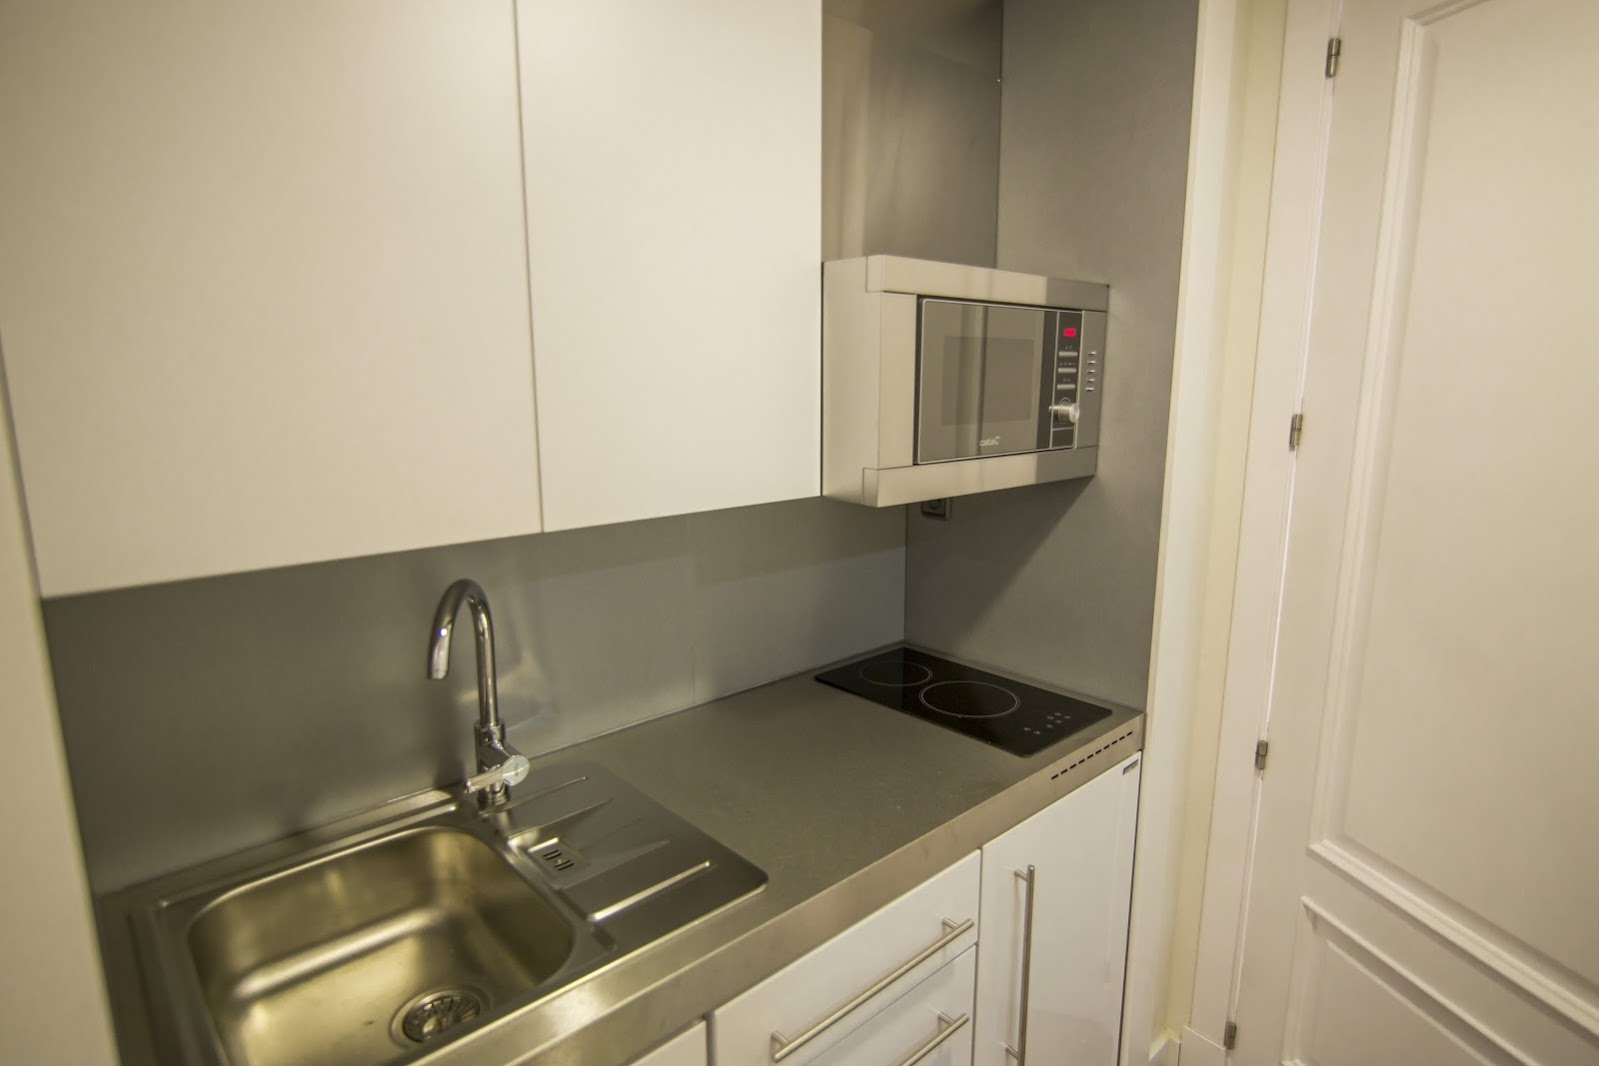 cocina apartamento abuardillado